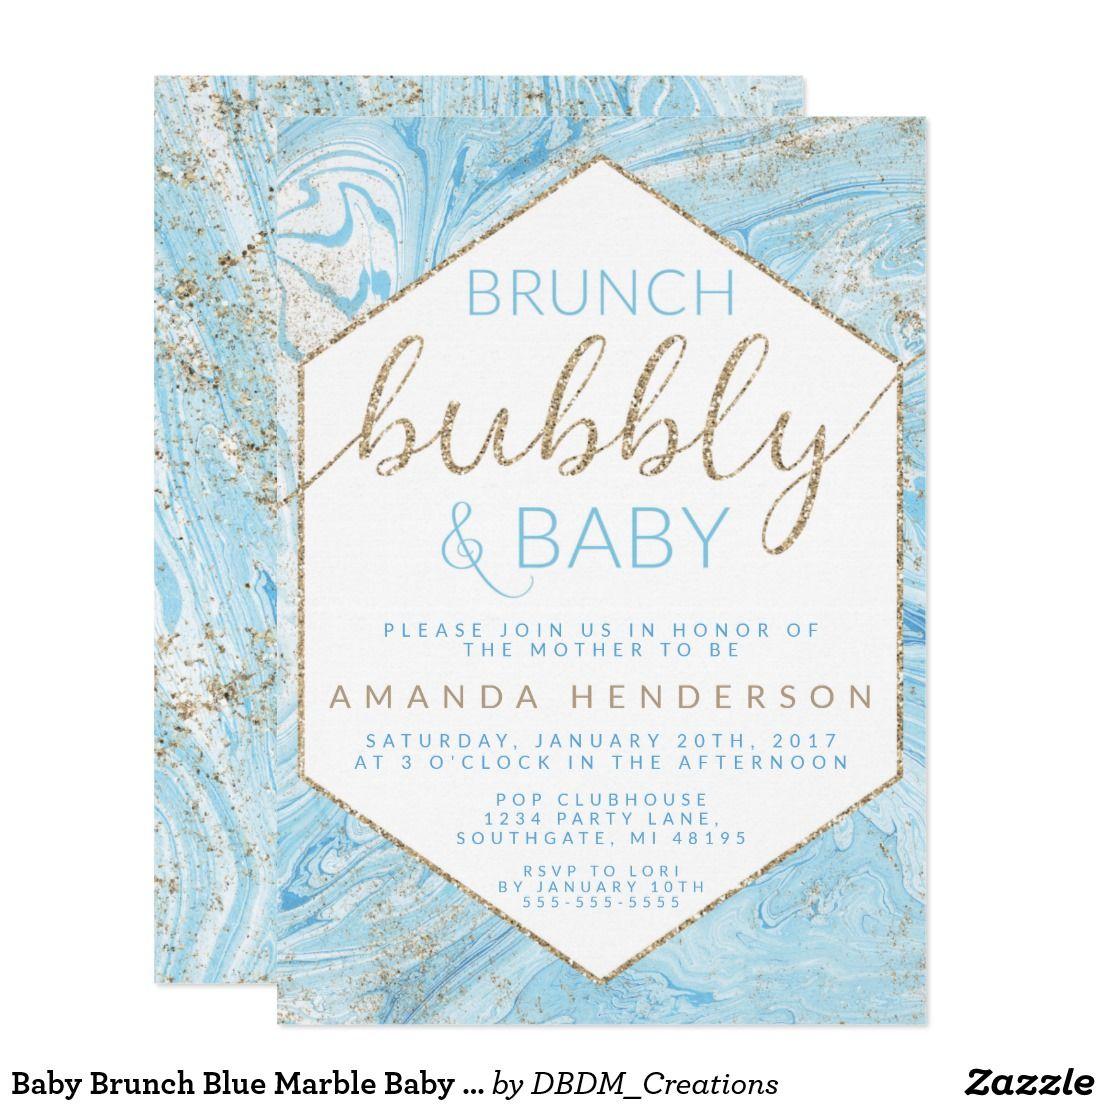 Baby Brunch Blue Marble Baby Shower Invitation   Shower invitations